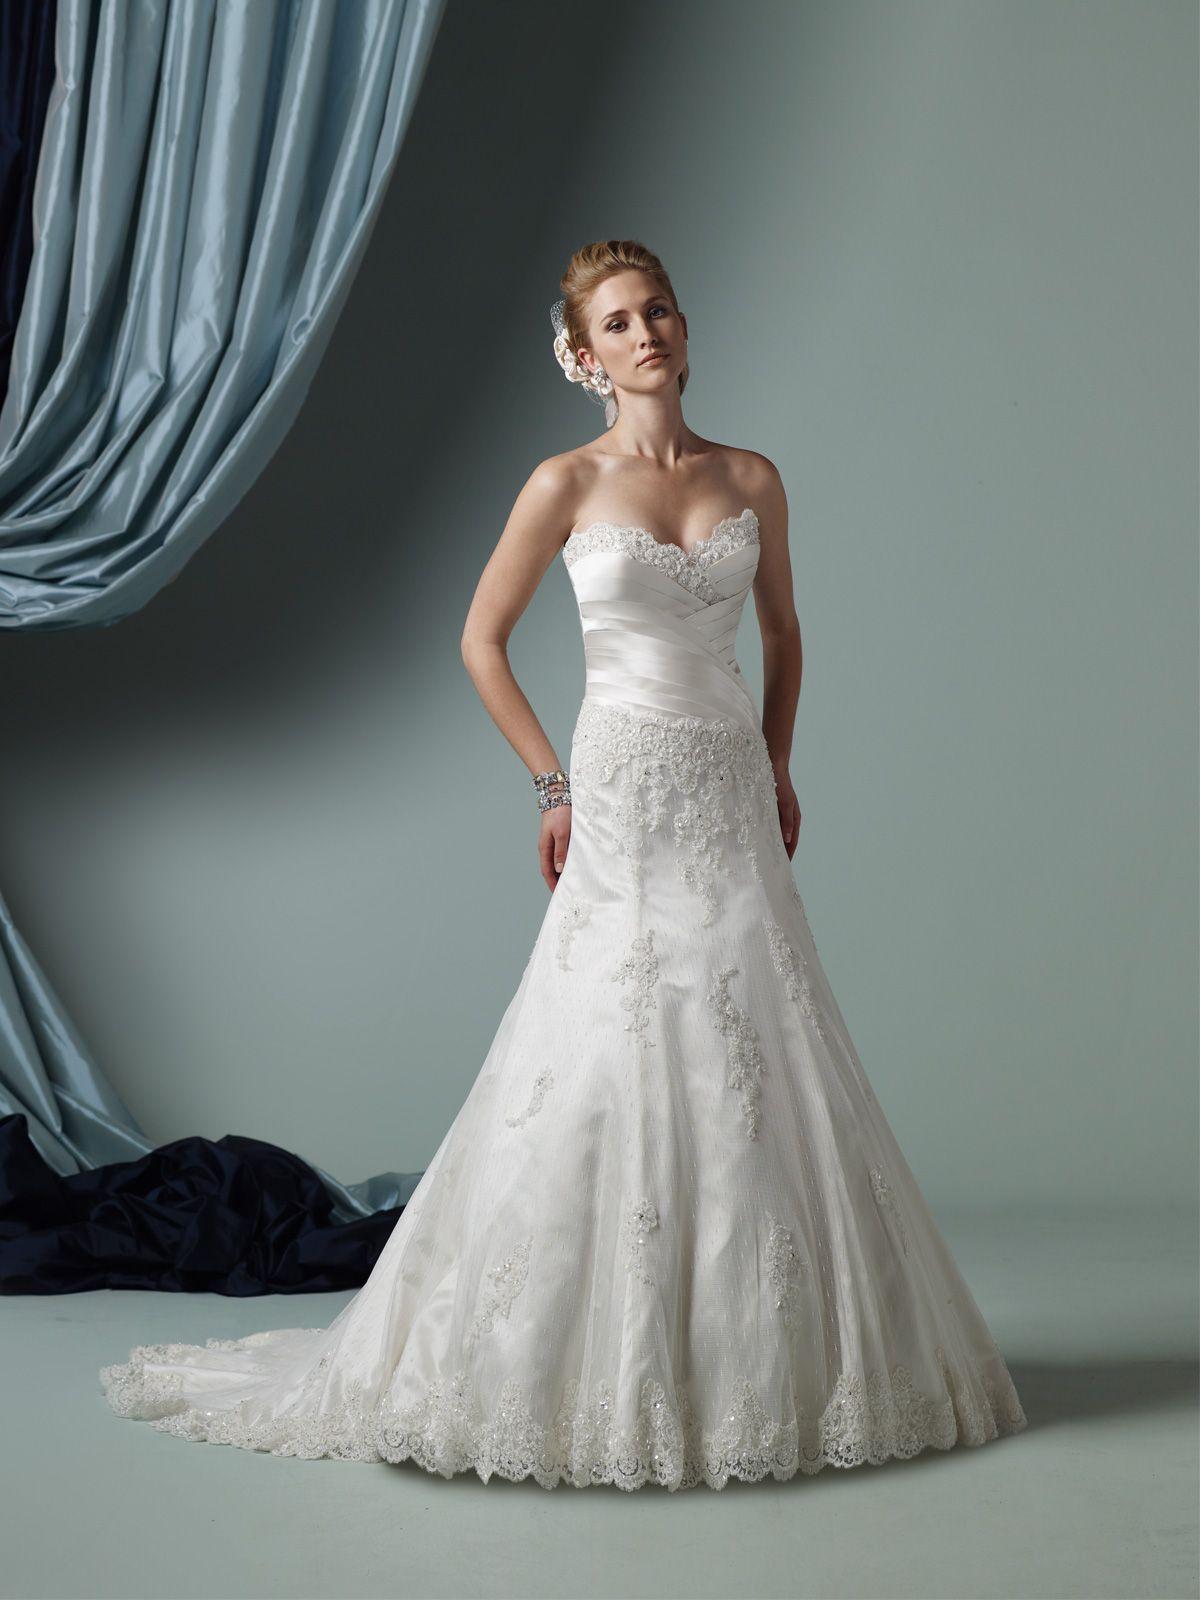 Contemporary Designer Short Wedding Dress Ideas - All Wedding ...